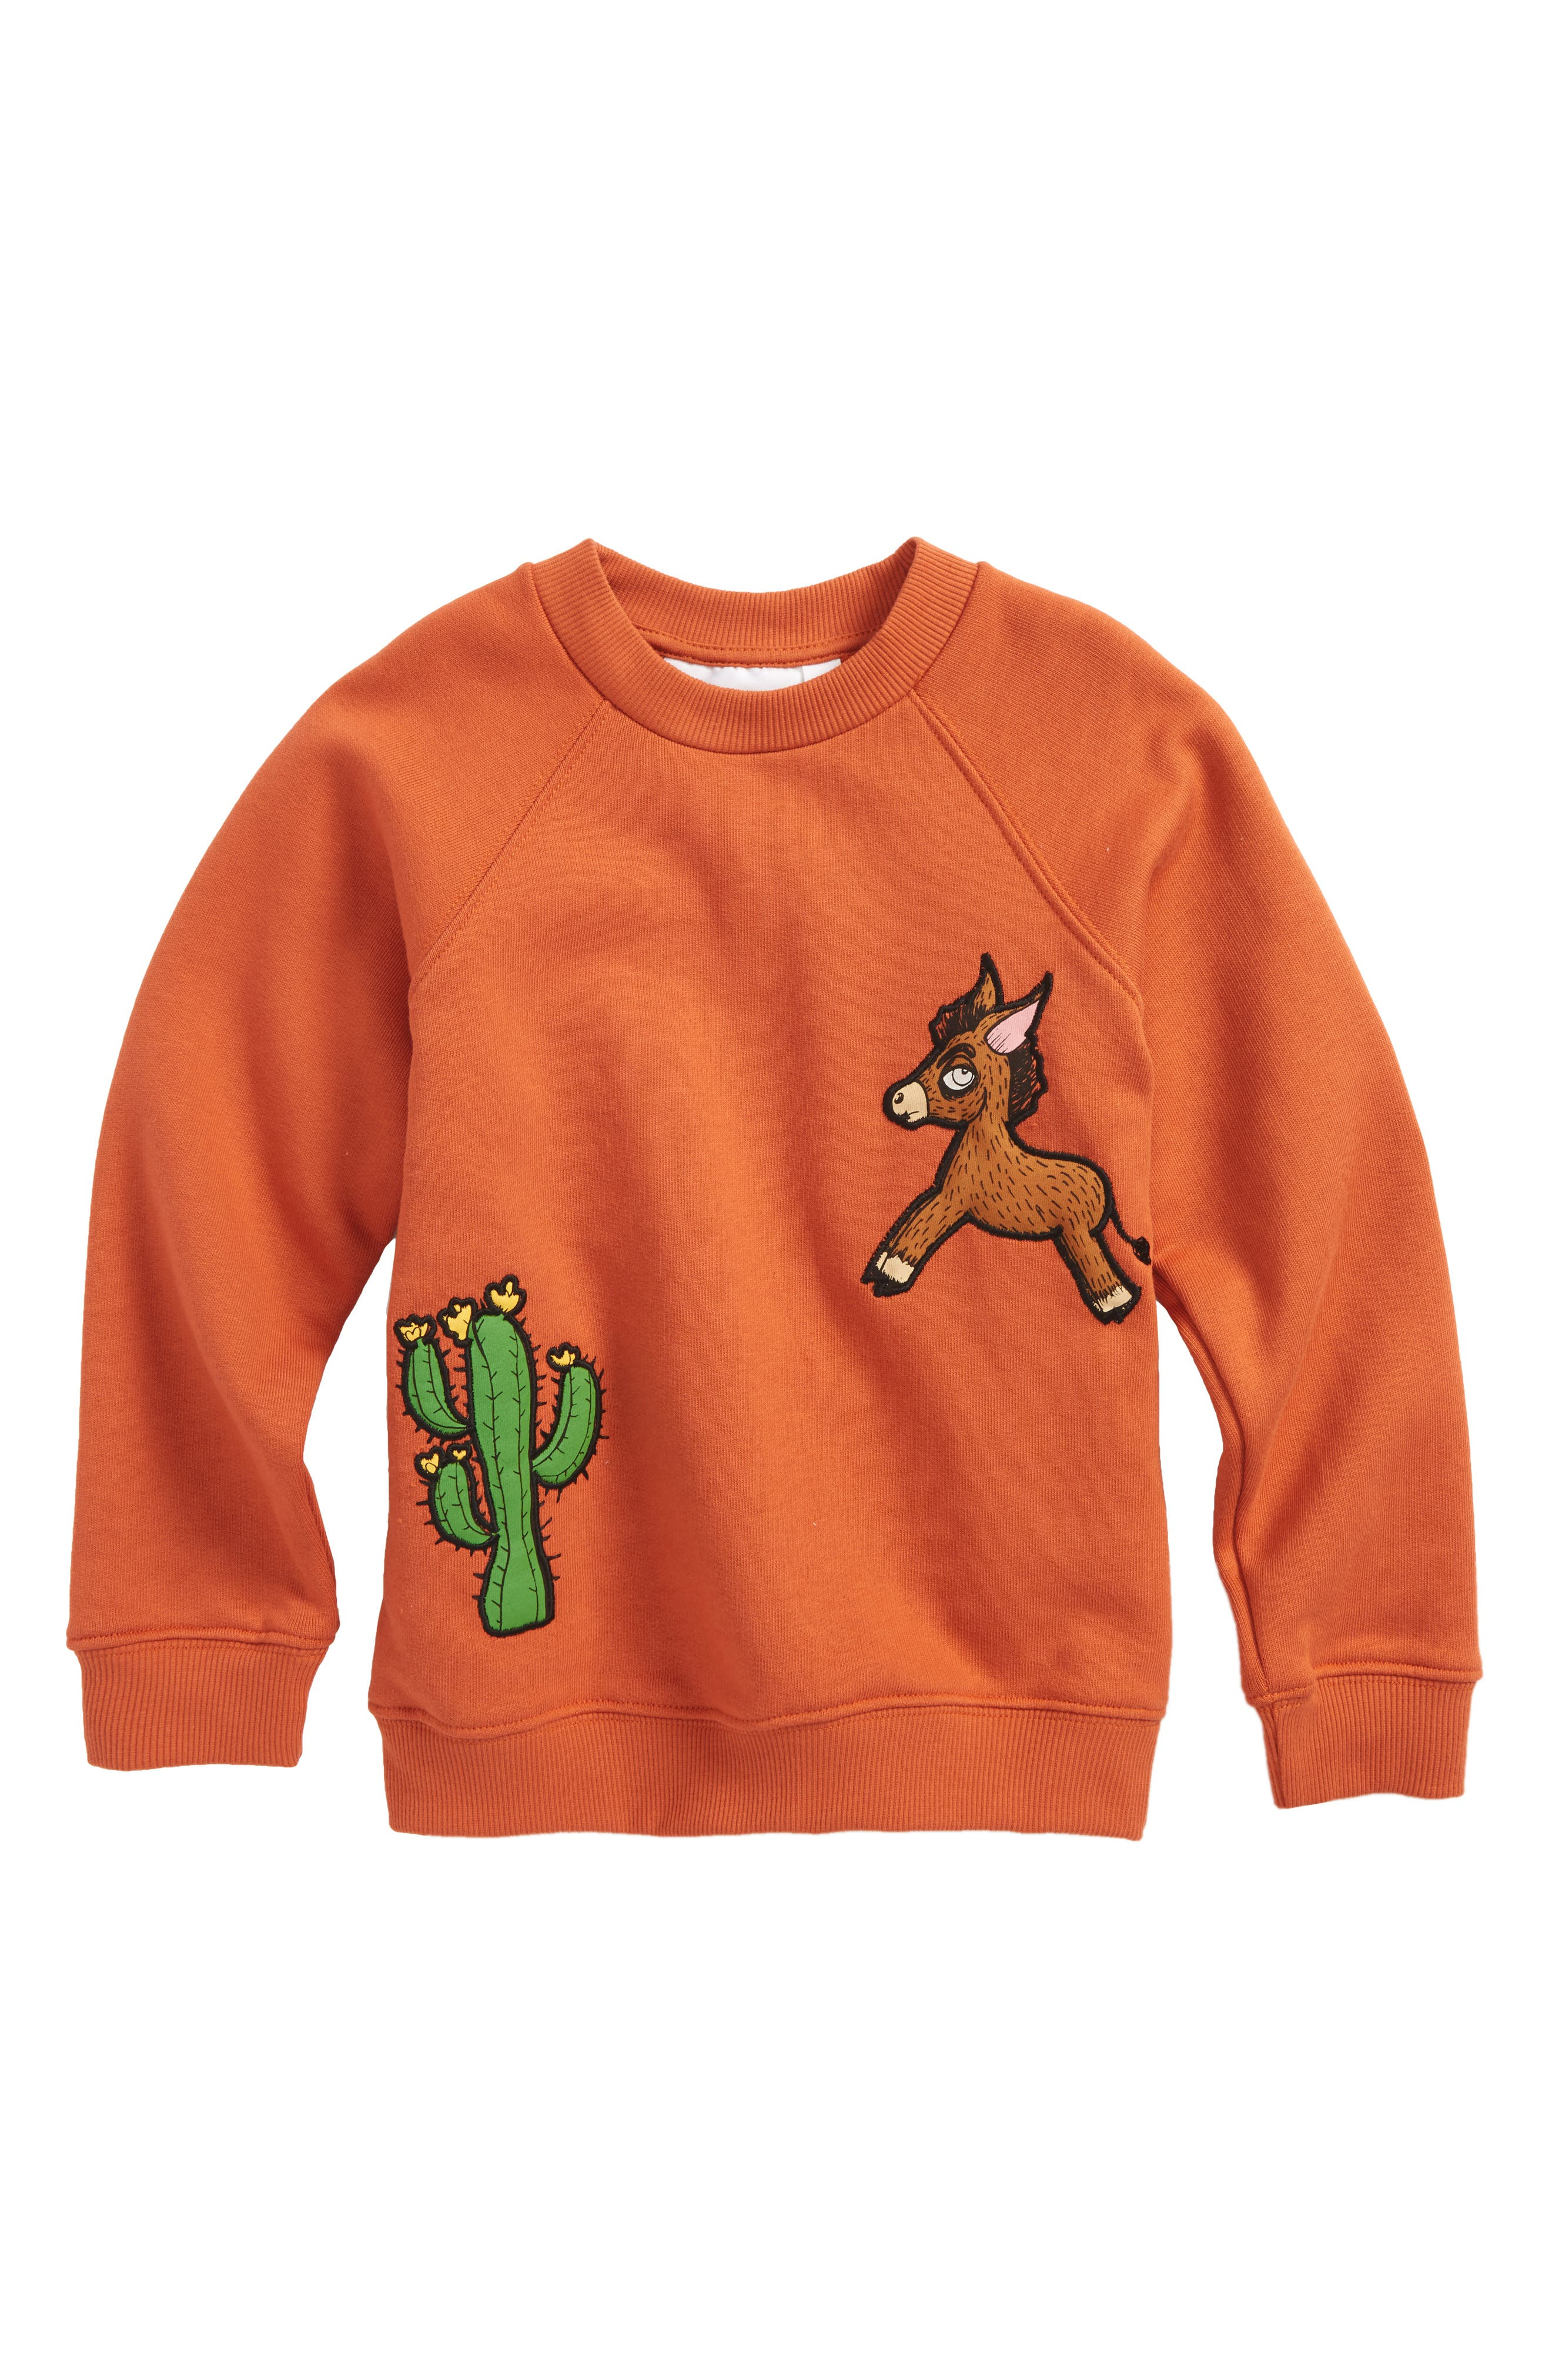 Donkey & Cactus Appliqué Organic Cotton Sweatshirt,                         Main,                         color, 800